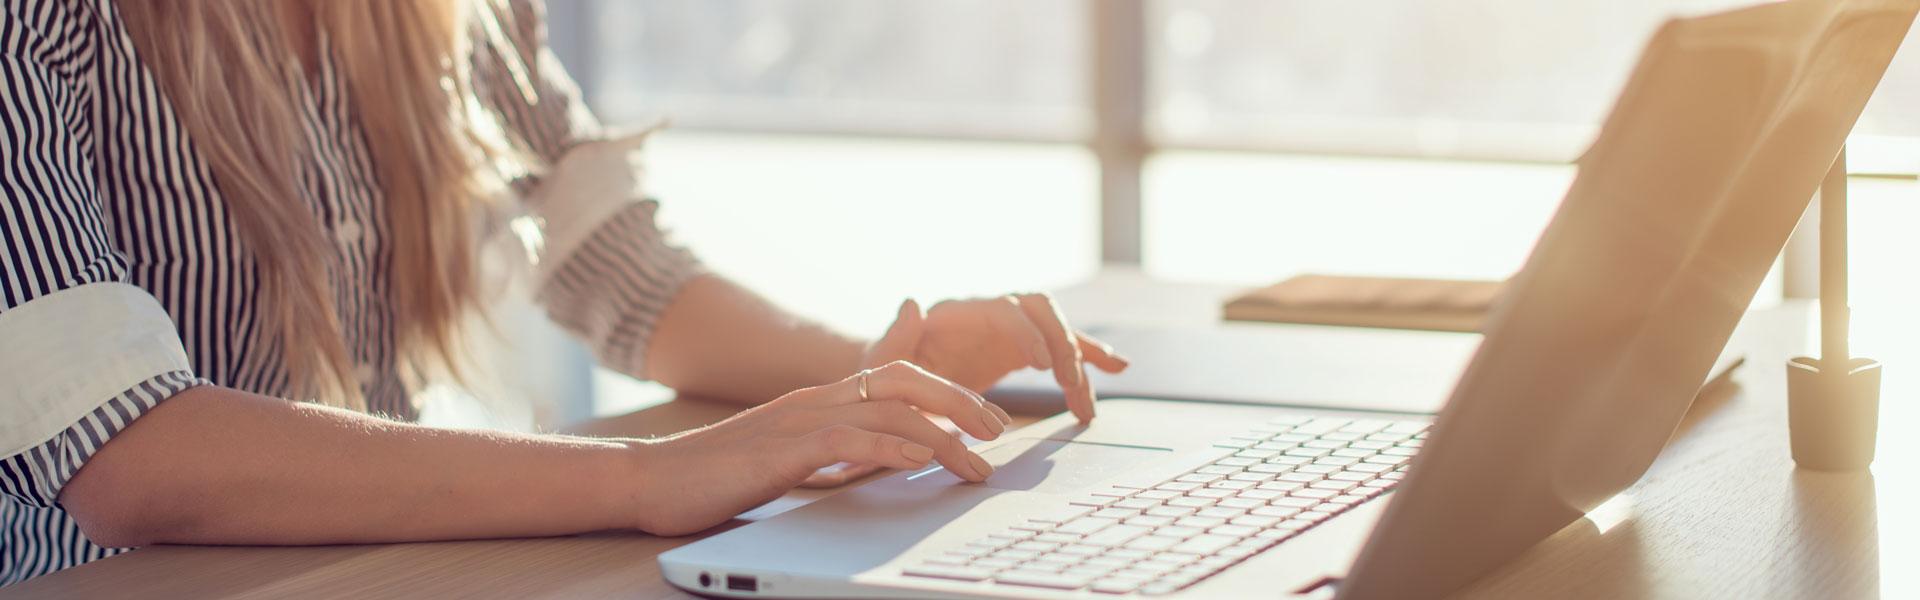 selman-holman-online-coding-training